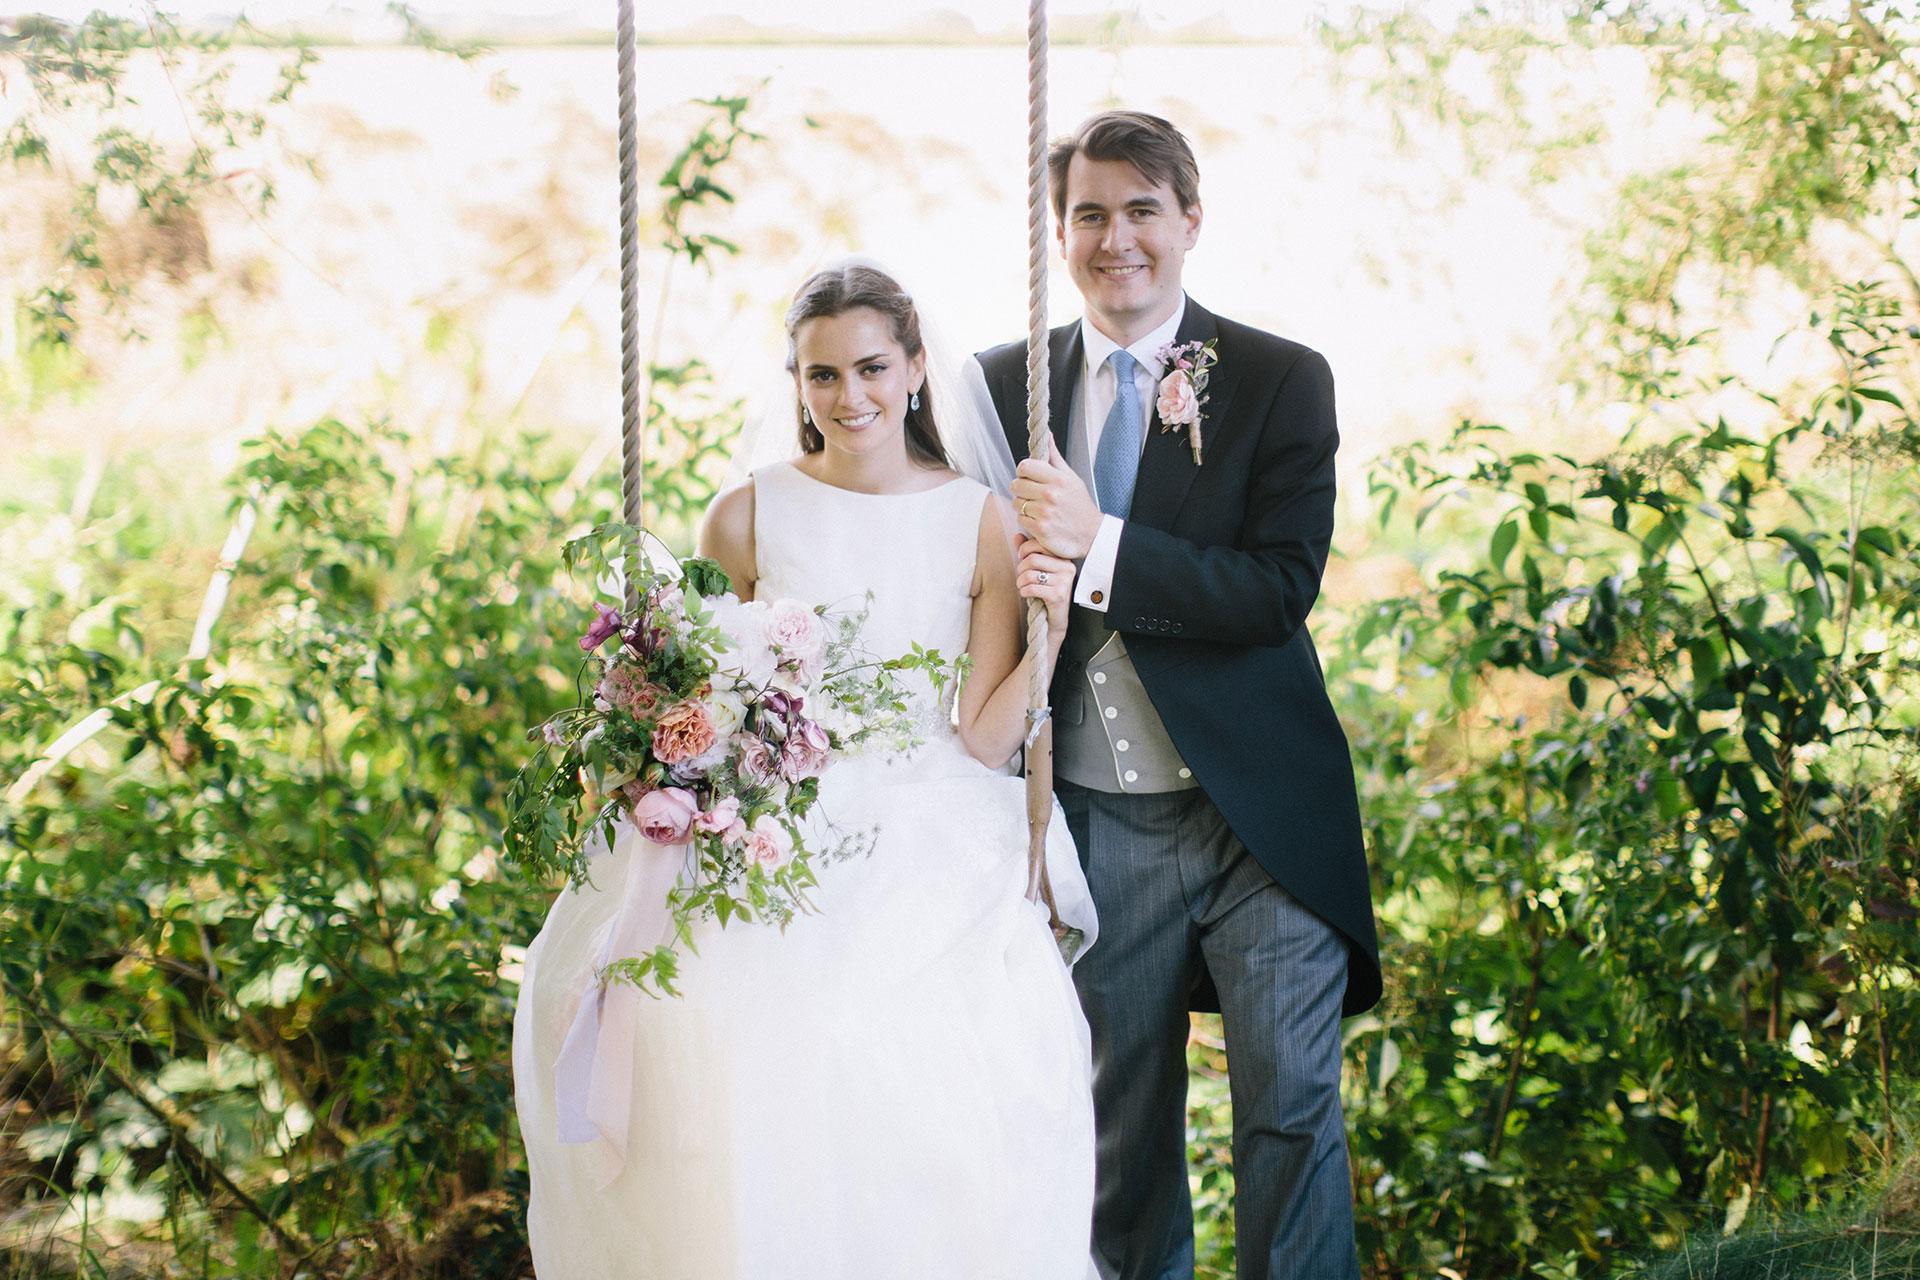 Langar-Hall-wedding-photographer-in-Nottinghamshire-Michael-Newington-Gray-69.jpg